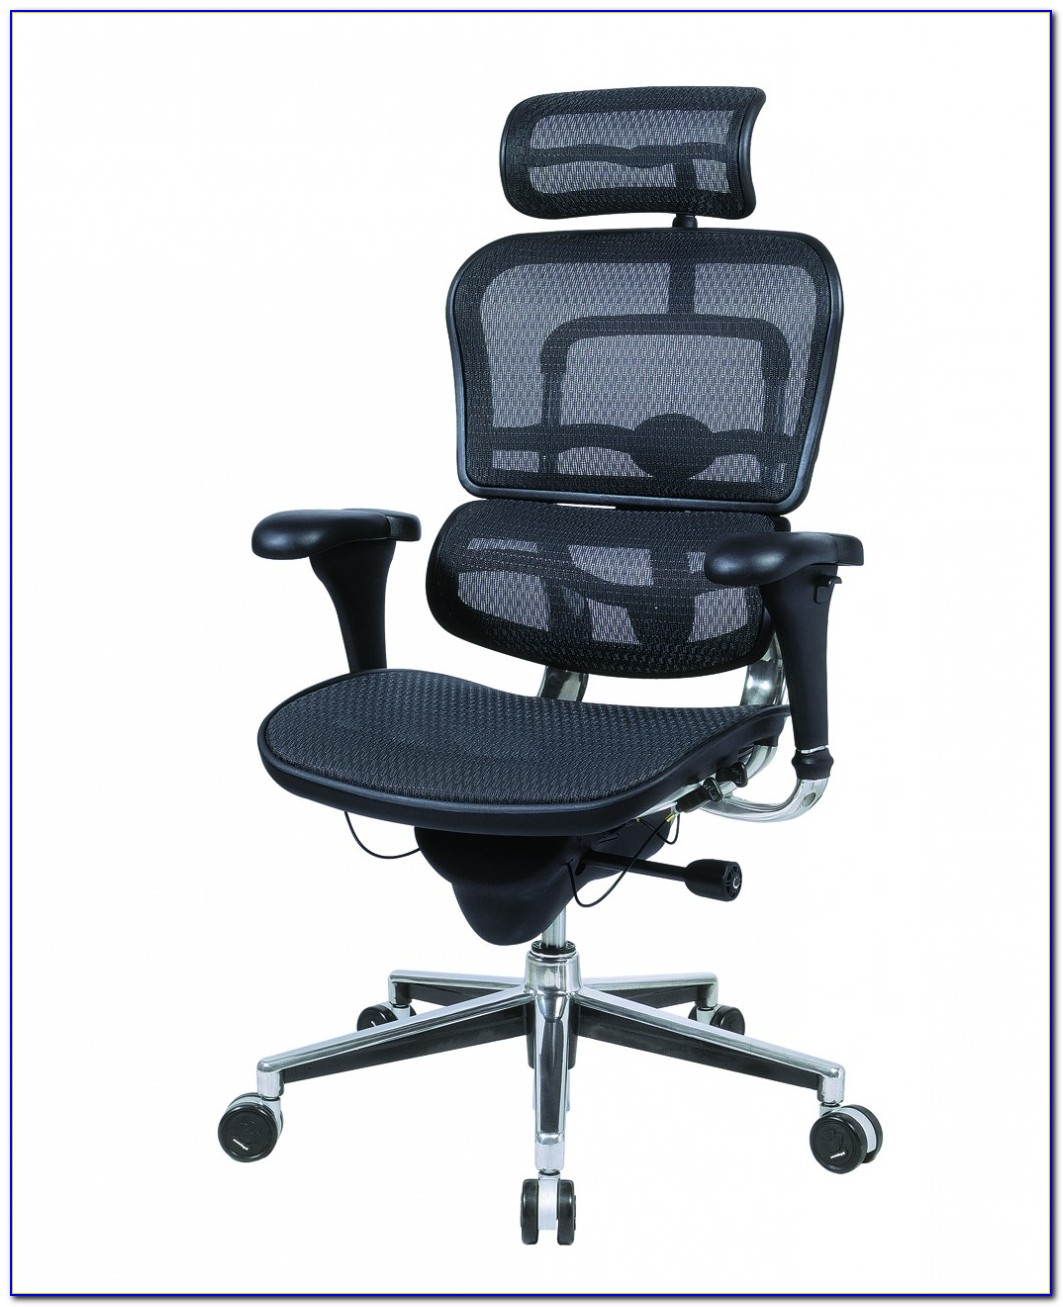 Leather Ergonomic Office Desk Chair